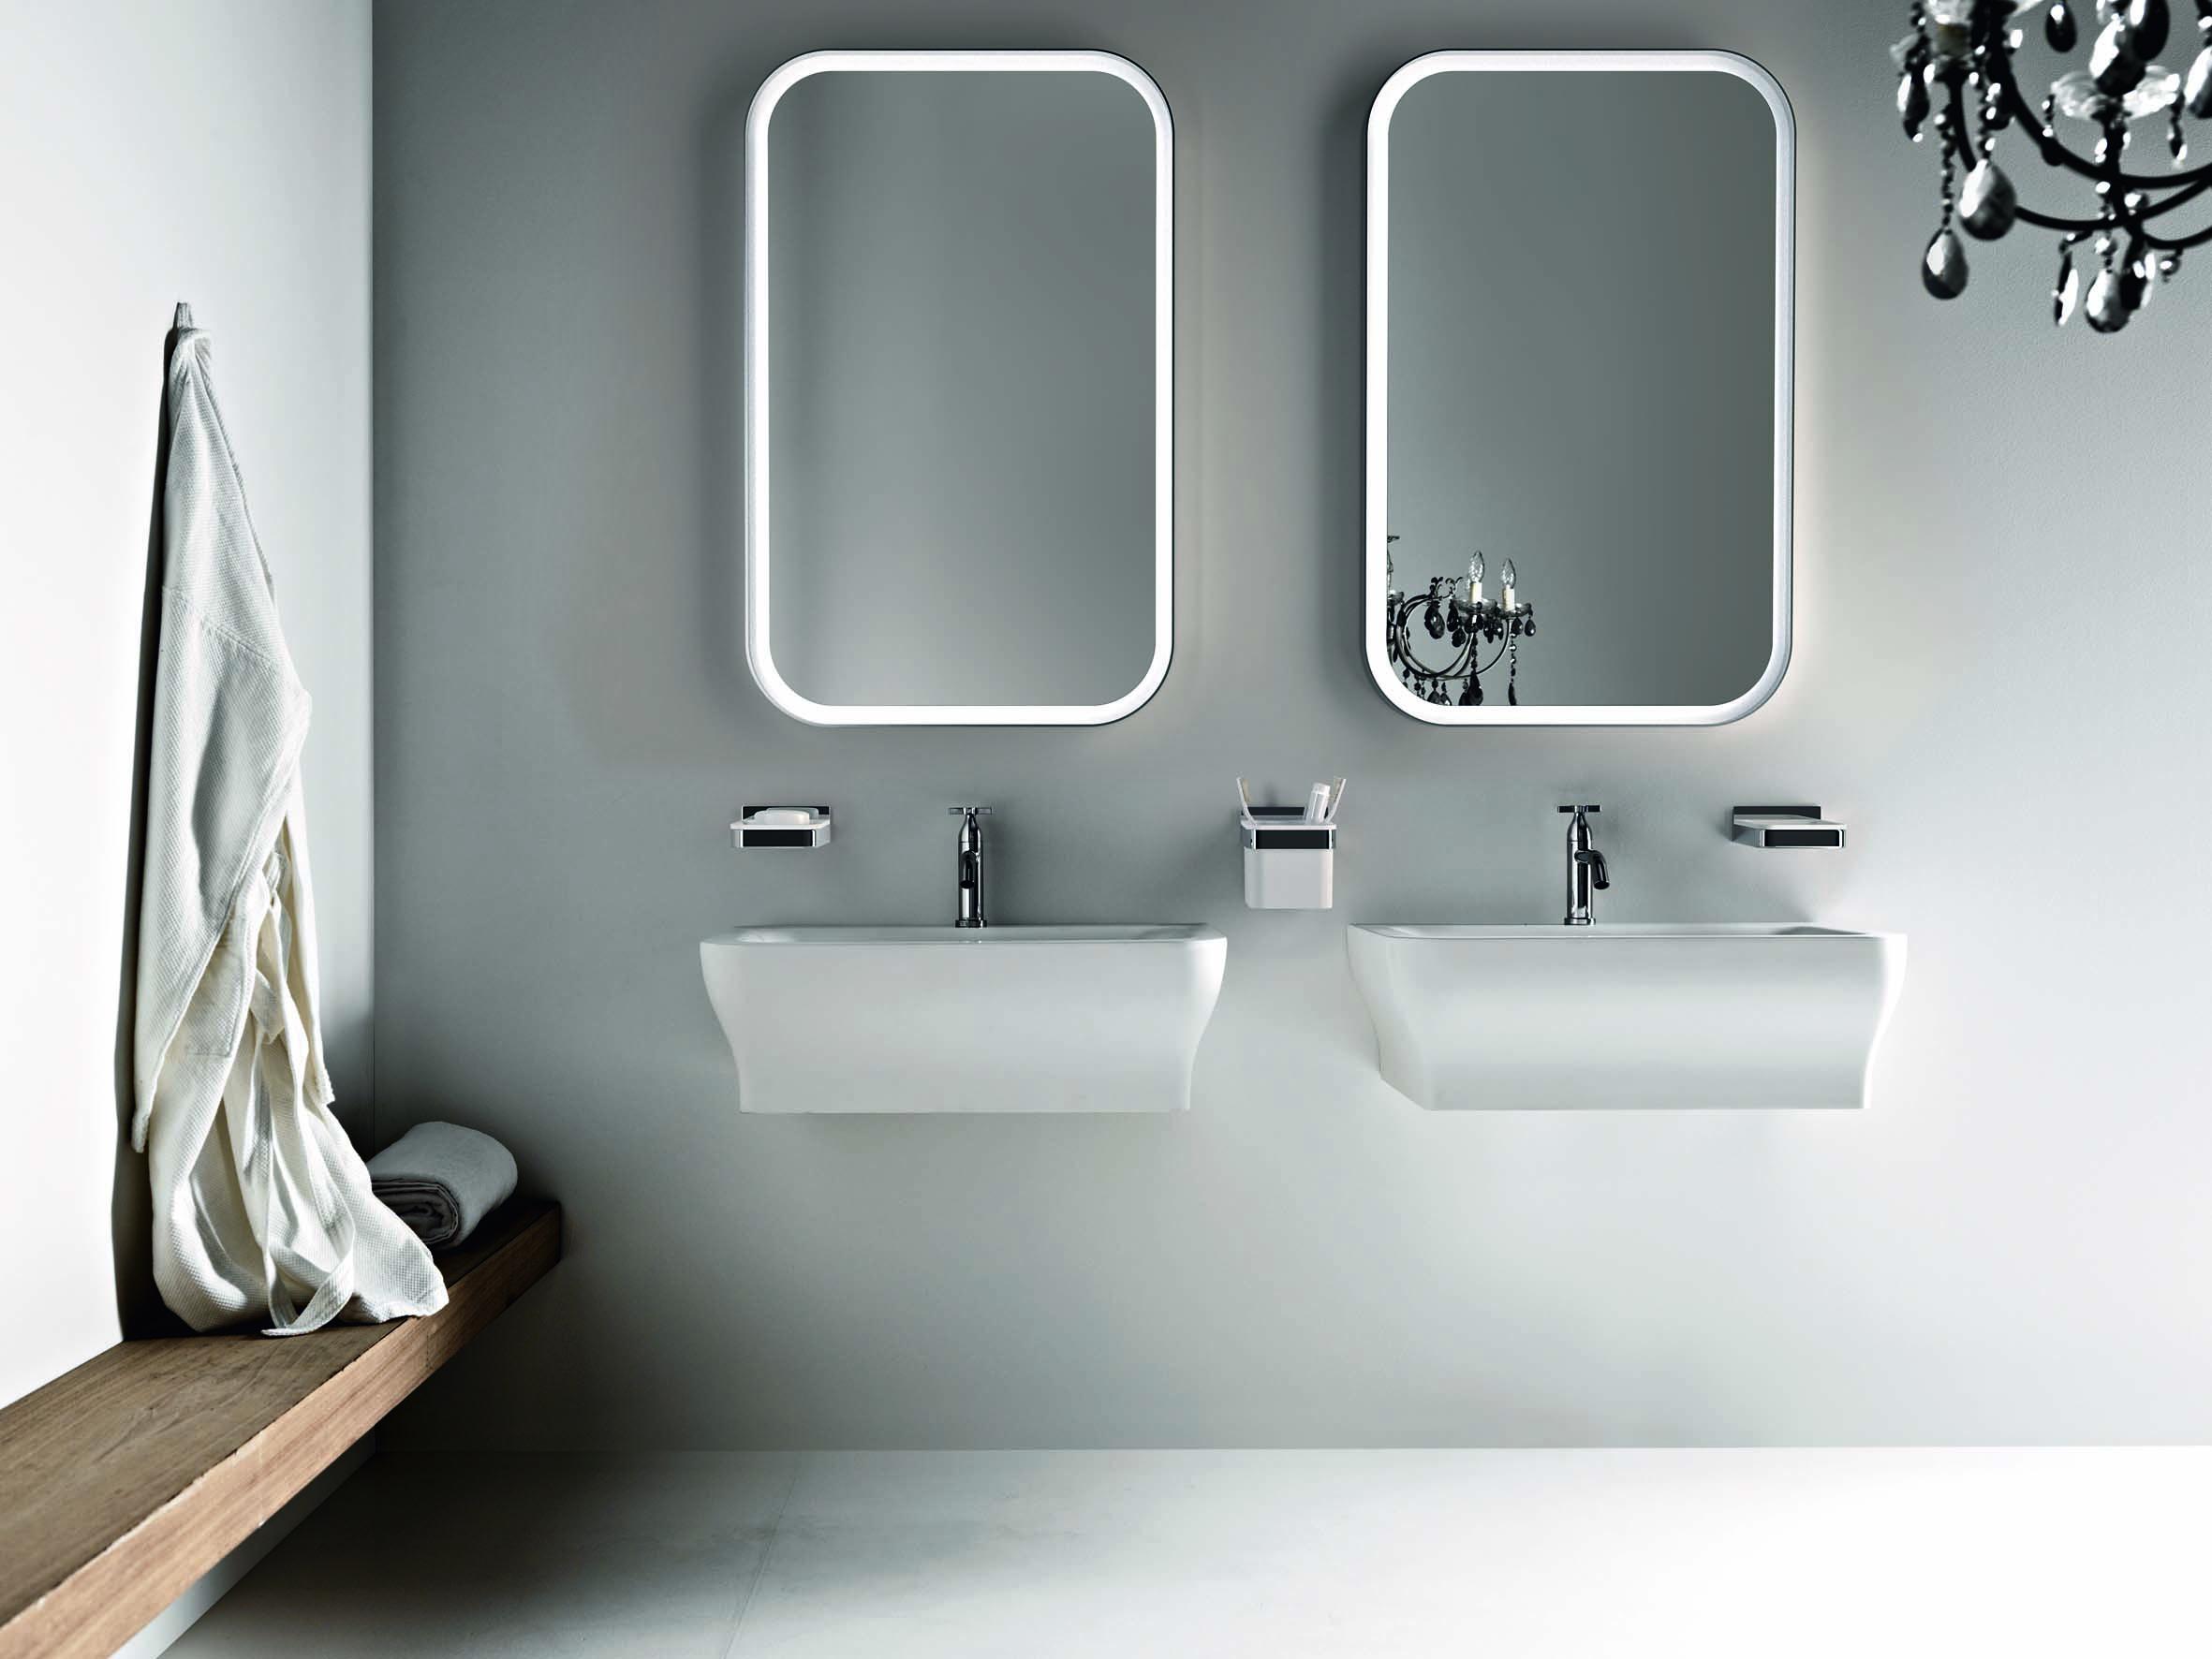 ... baño Agape · Lavabos modernos de la marca italiana Agape ... 7fc0b87bfa2b